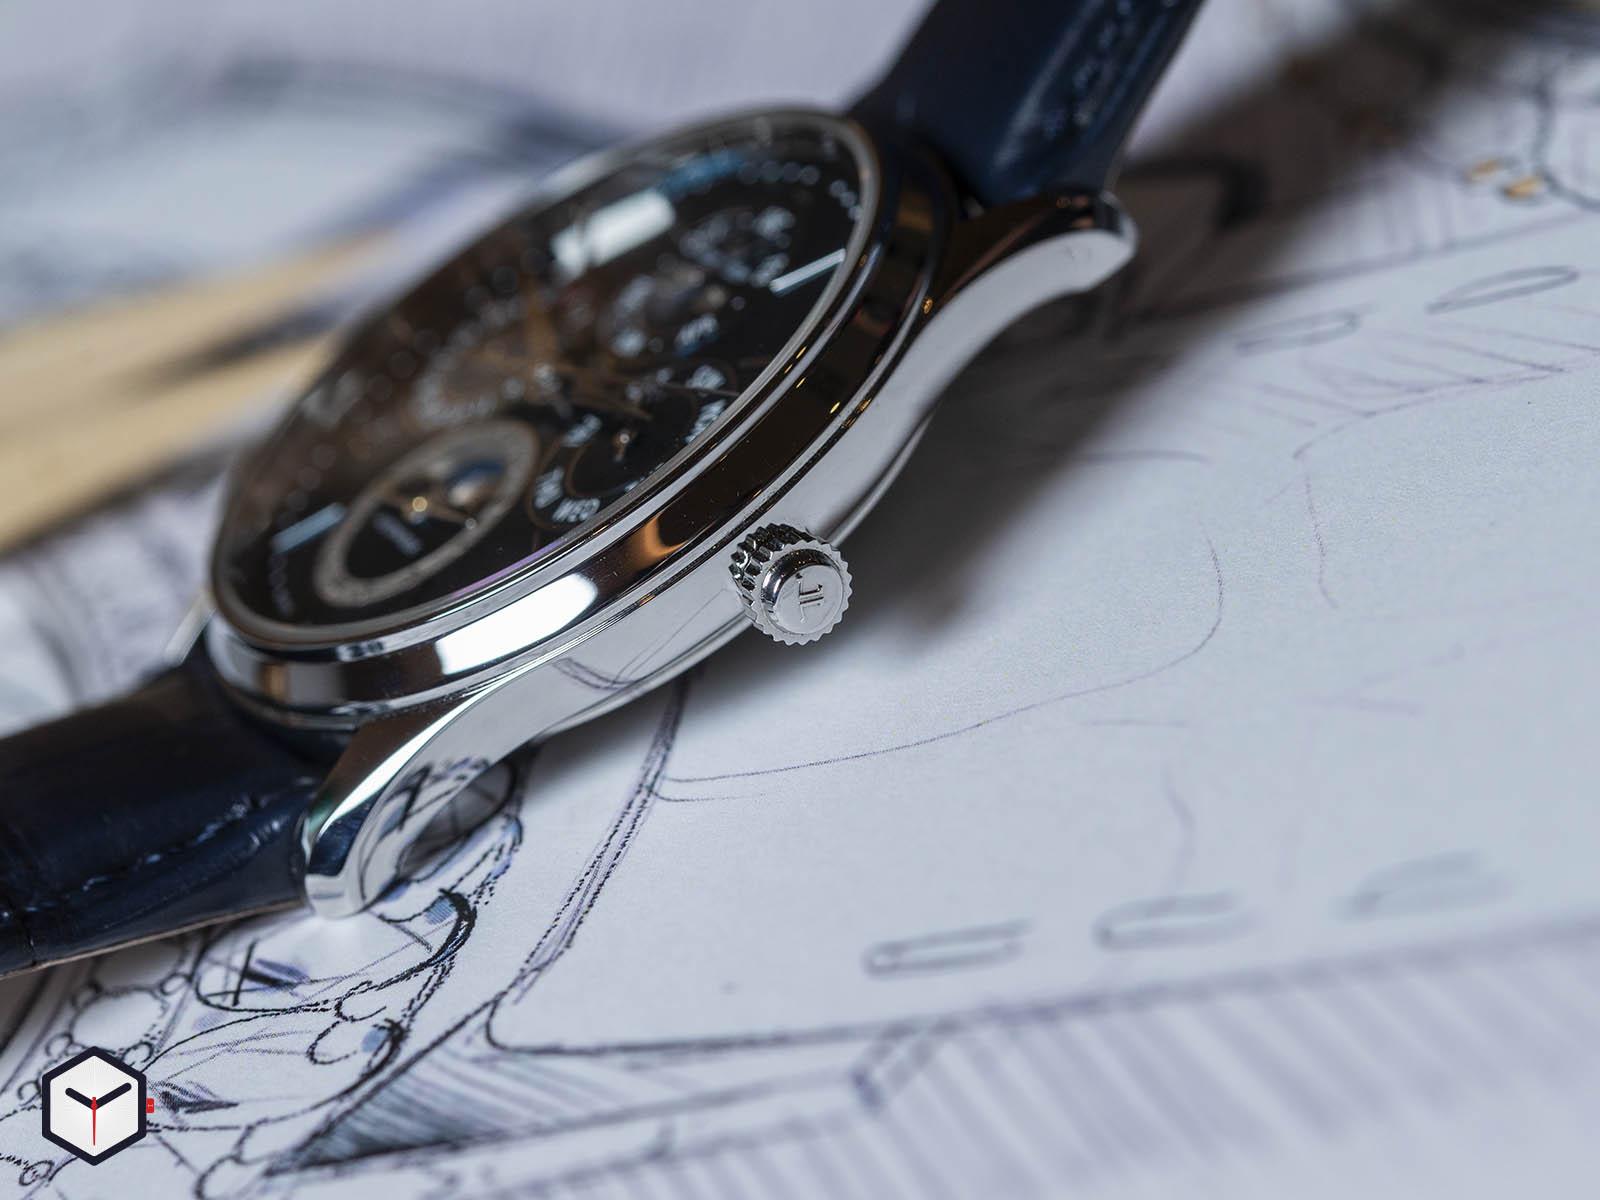 q13035e1-jaeger-lecoultre-master-ultra-thin-perpetual-enamel-limited-edition-2.jpg